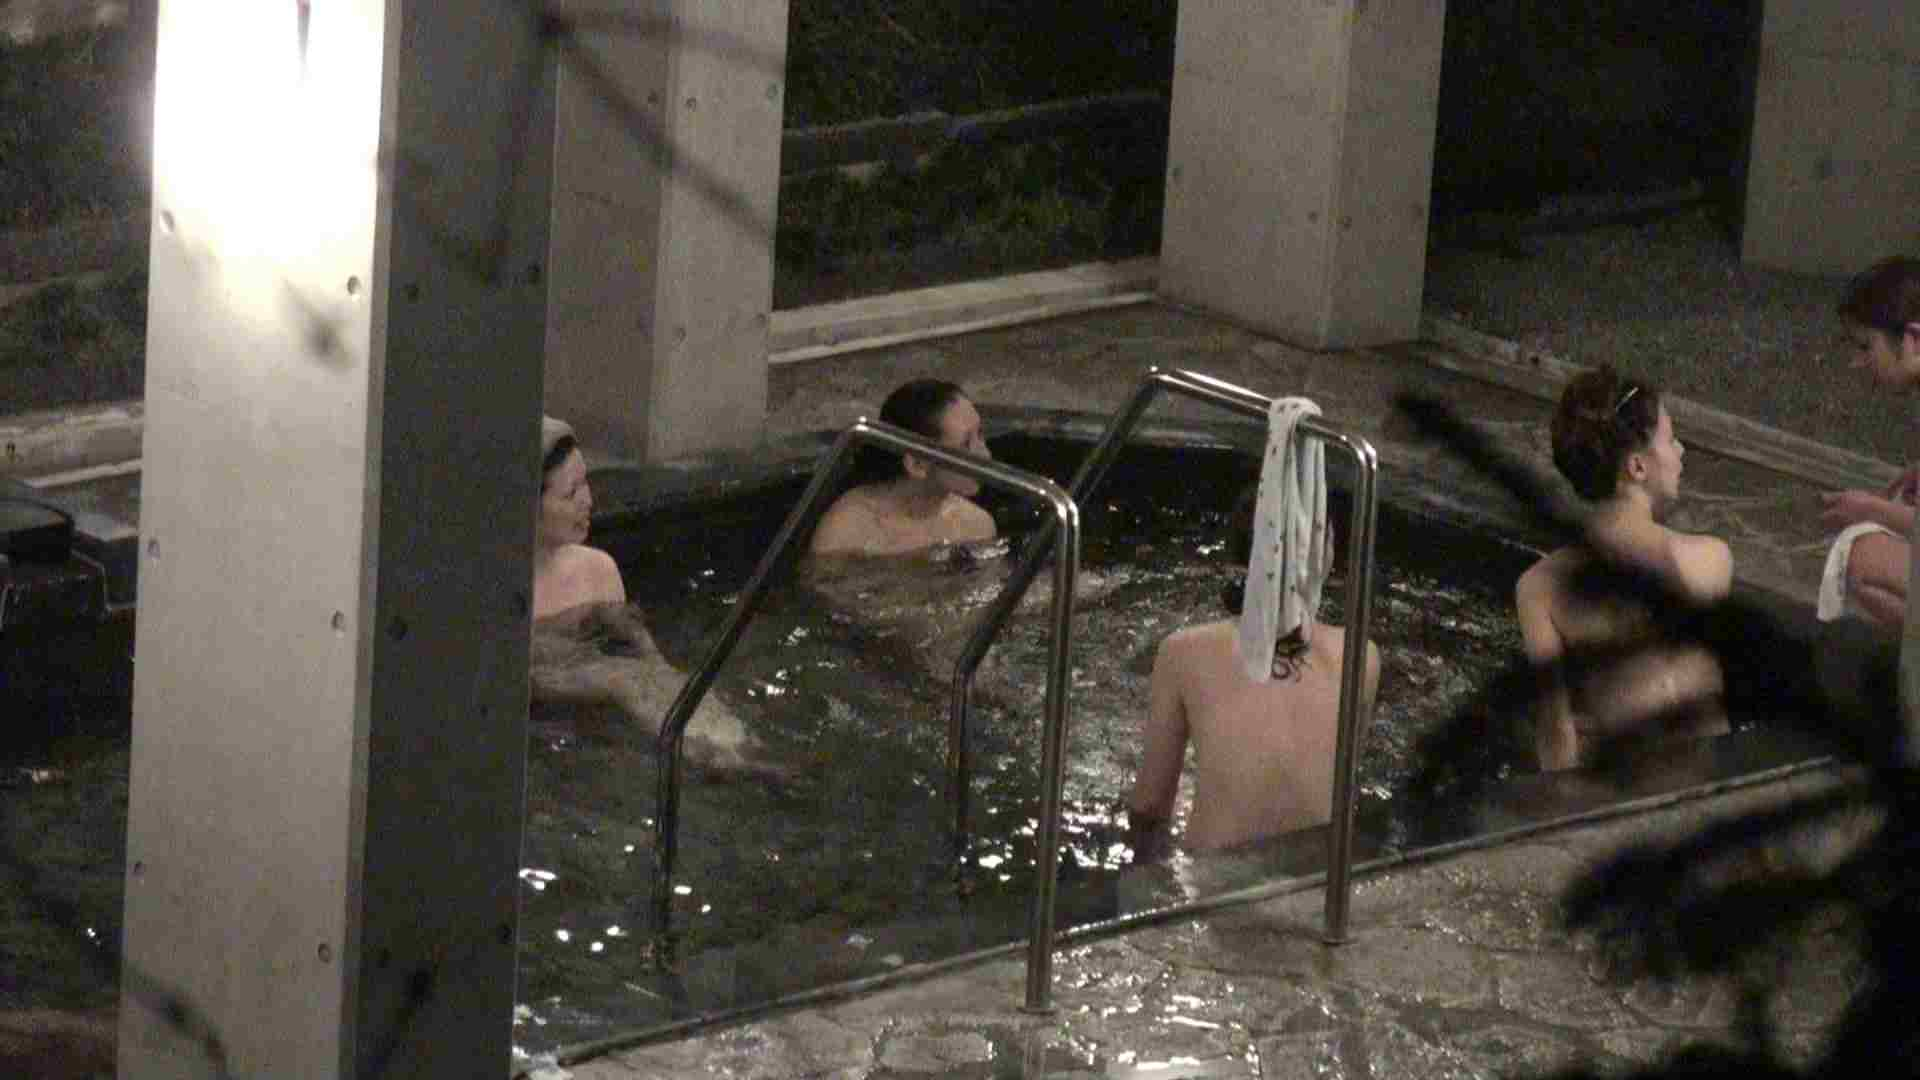 Aquaな露天風呂Vol.359 美しいOLの裸体 AV動画キャプチャ 94pic 56